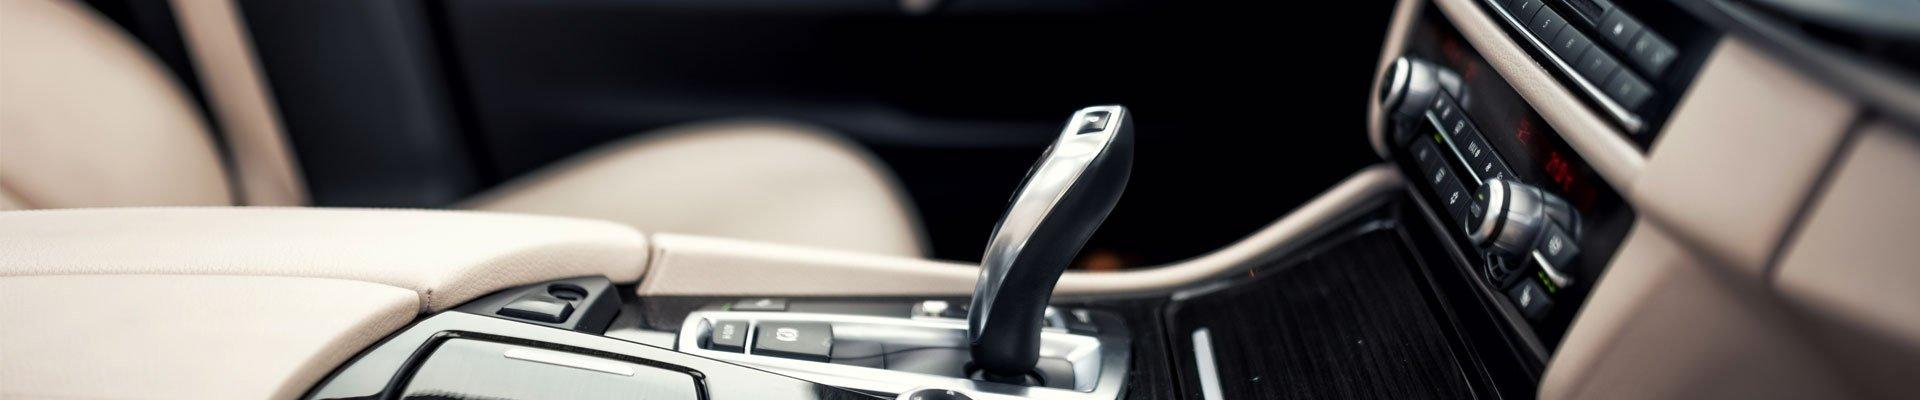 Velt's Personalized Car Care, LLC Car wash services